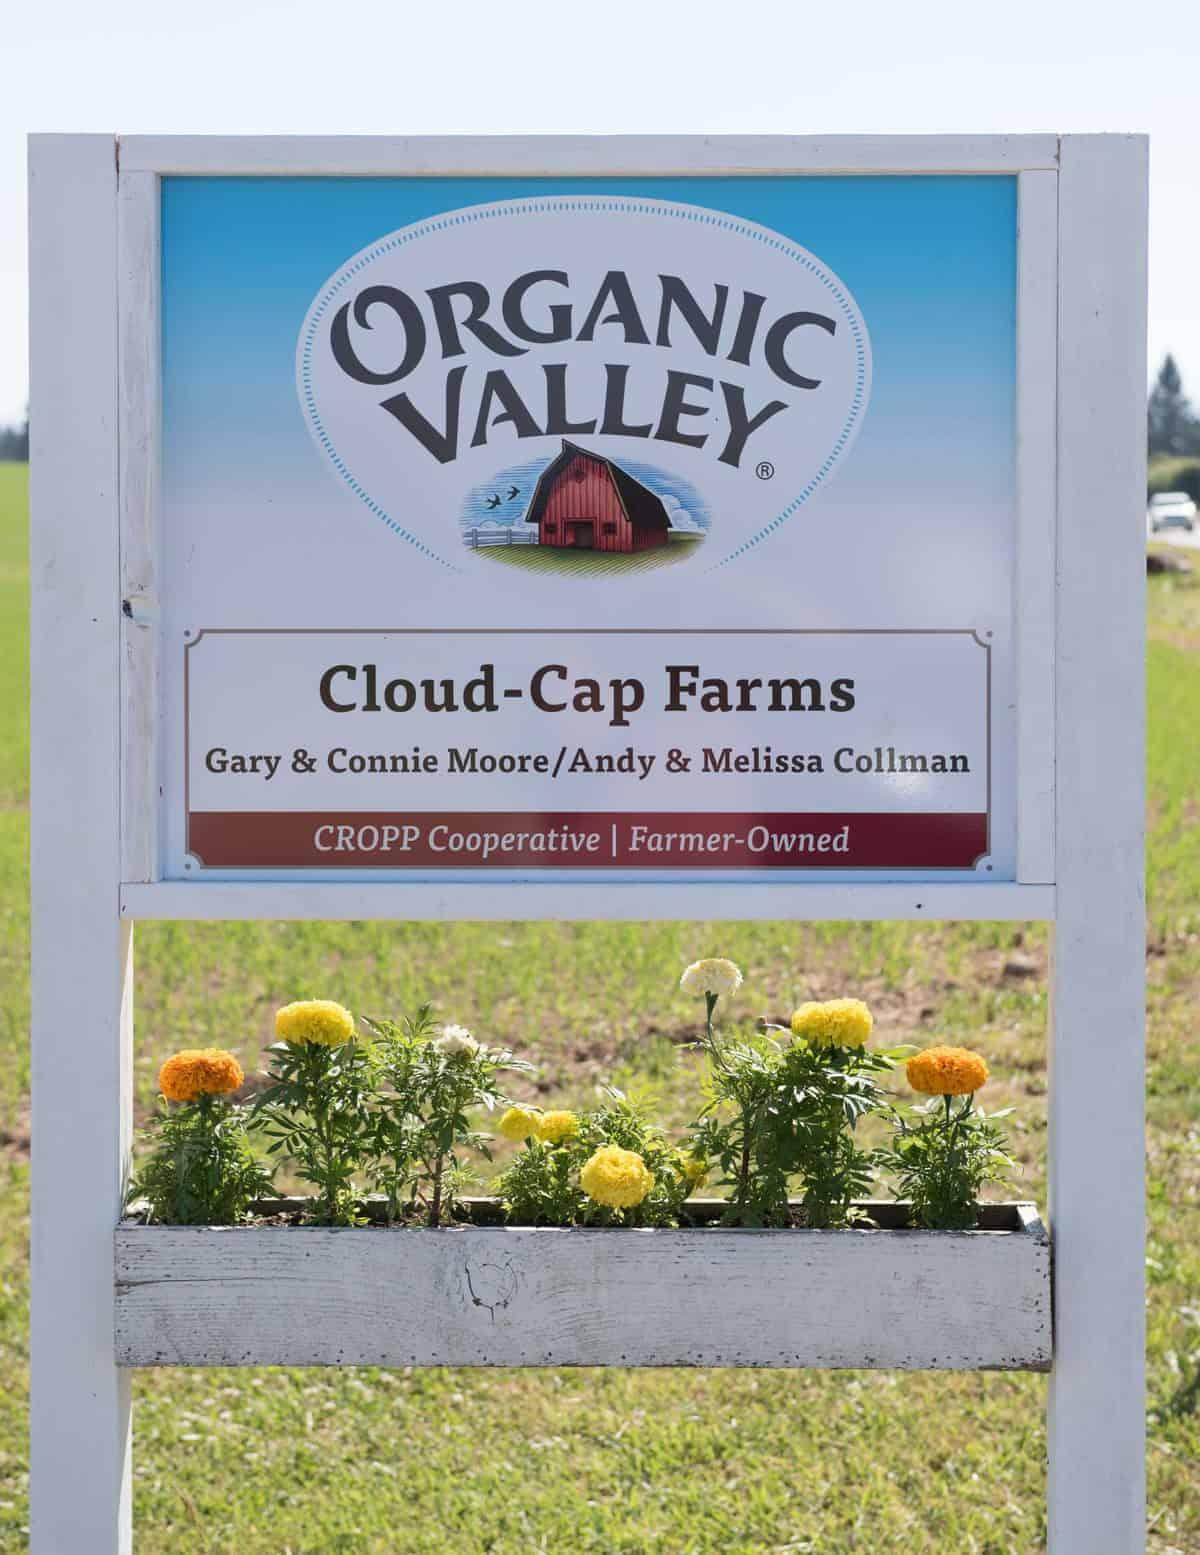 Organic dairy farm tour!